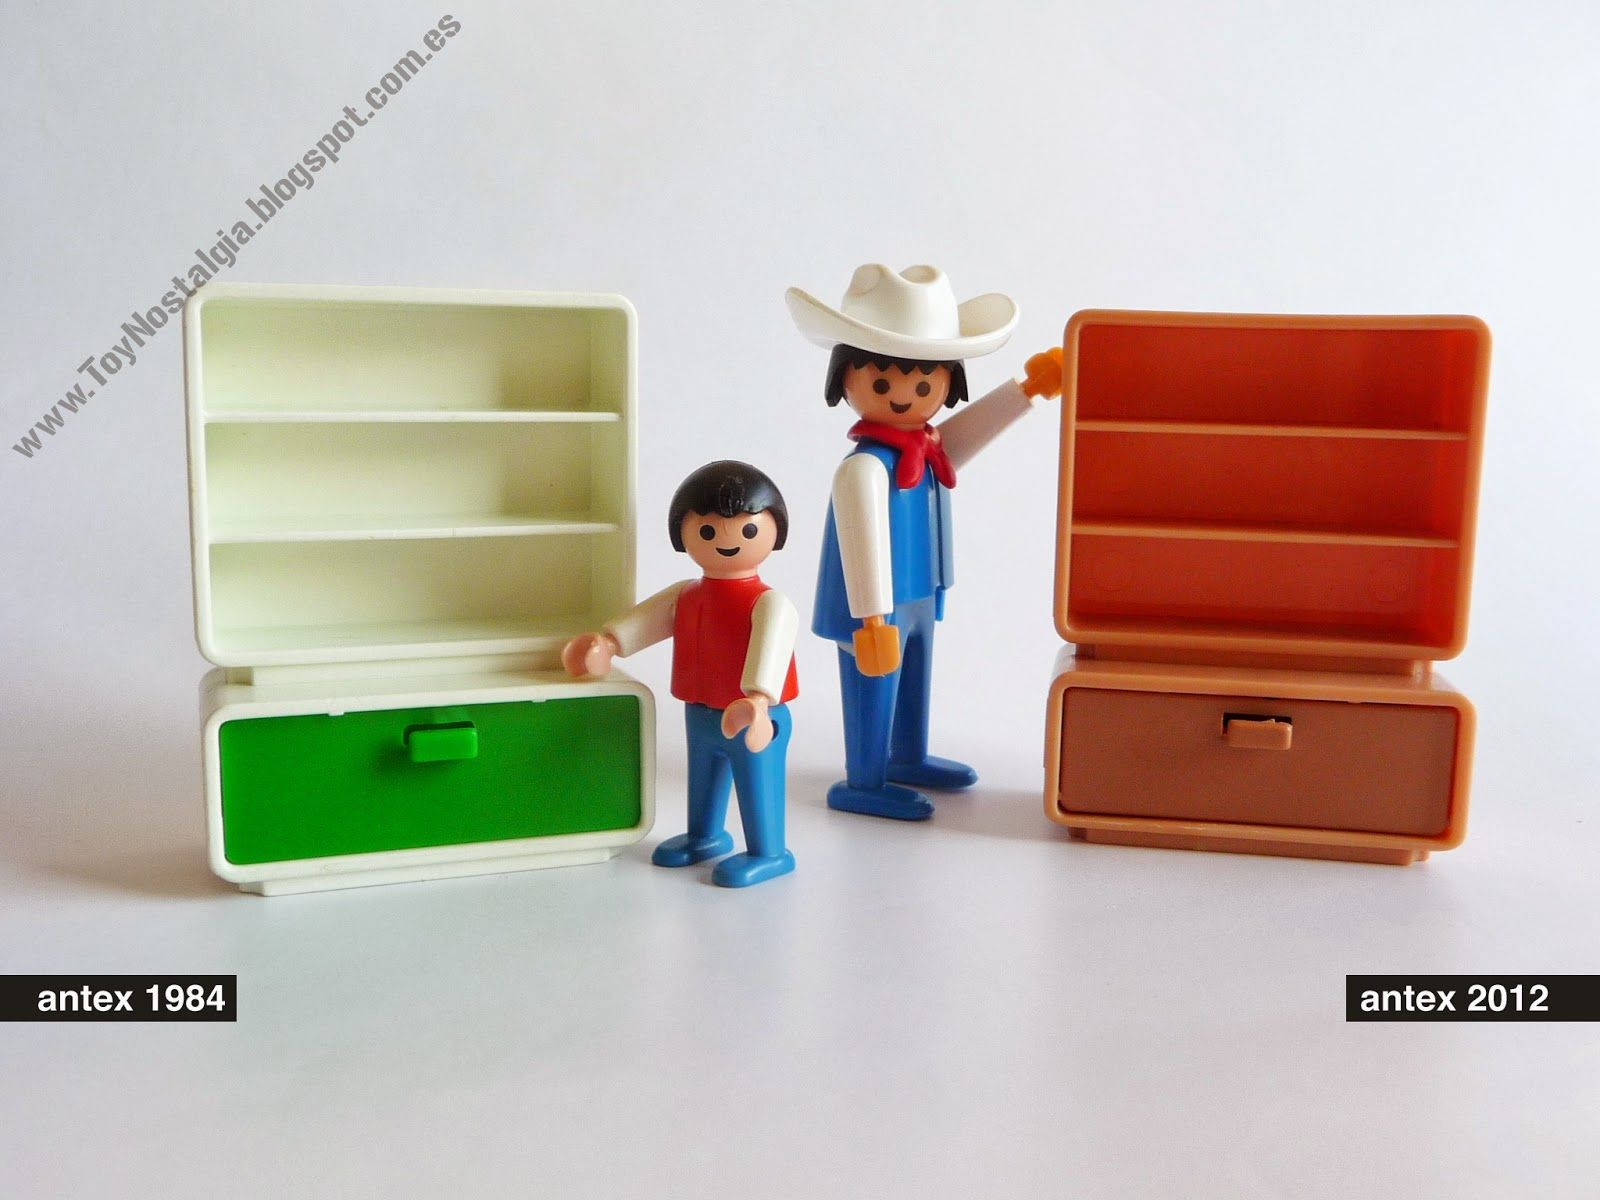 Antex C Playmobil Geobra Brandstatter En 2020 Playmobil Juguetes Antiguos Juguetes